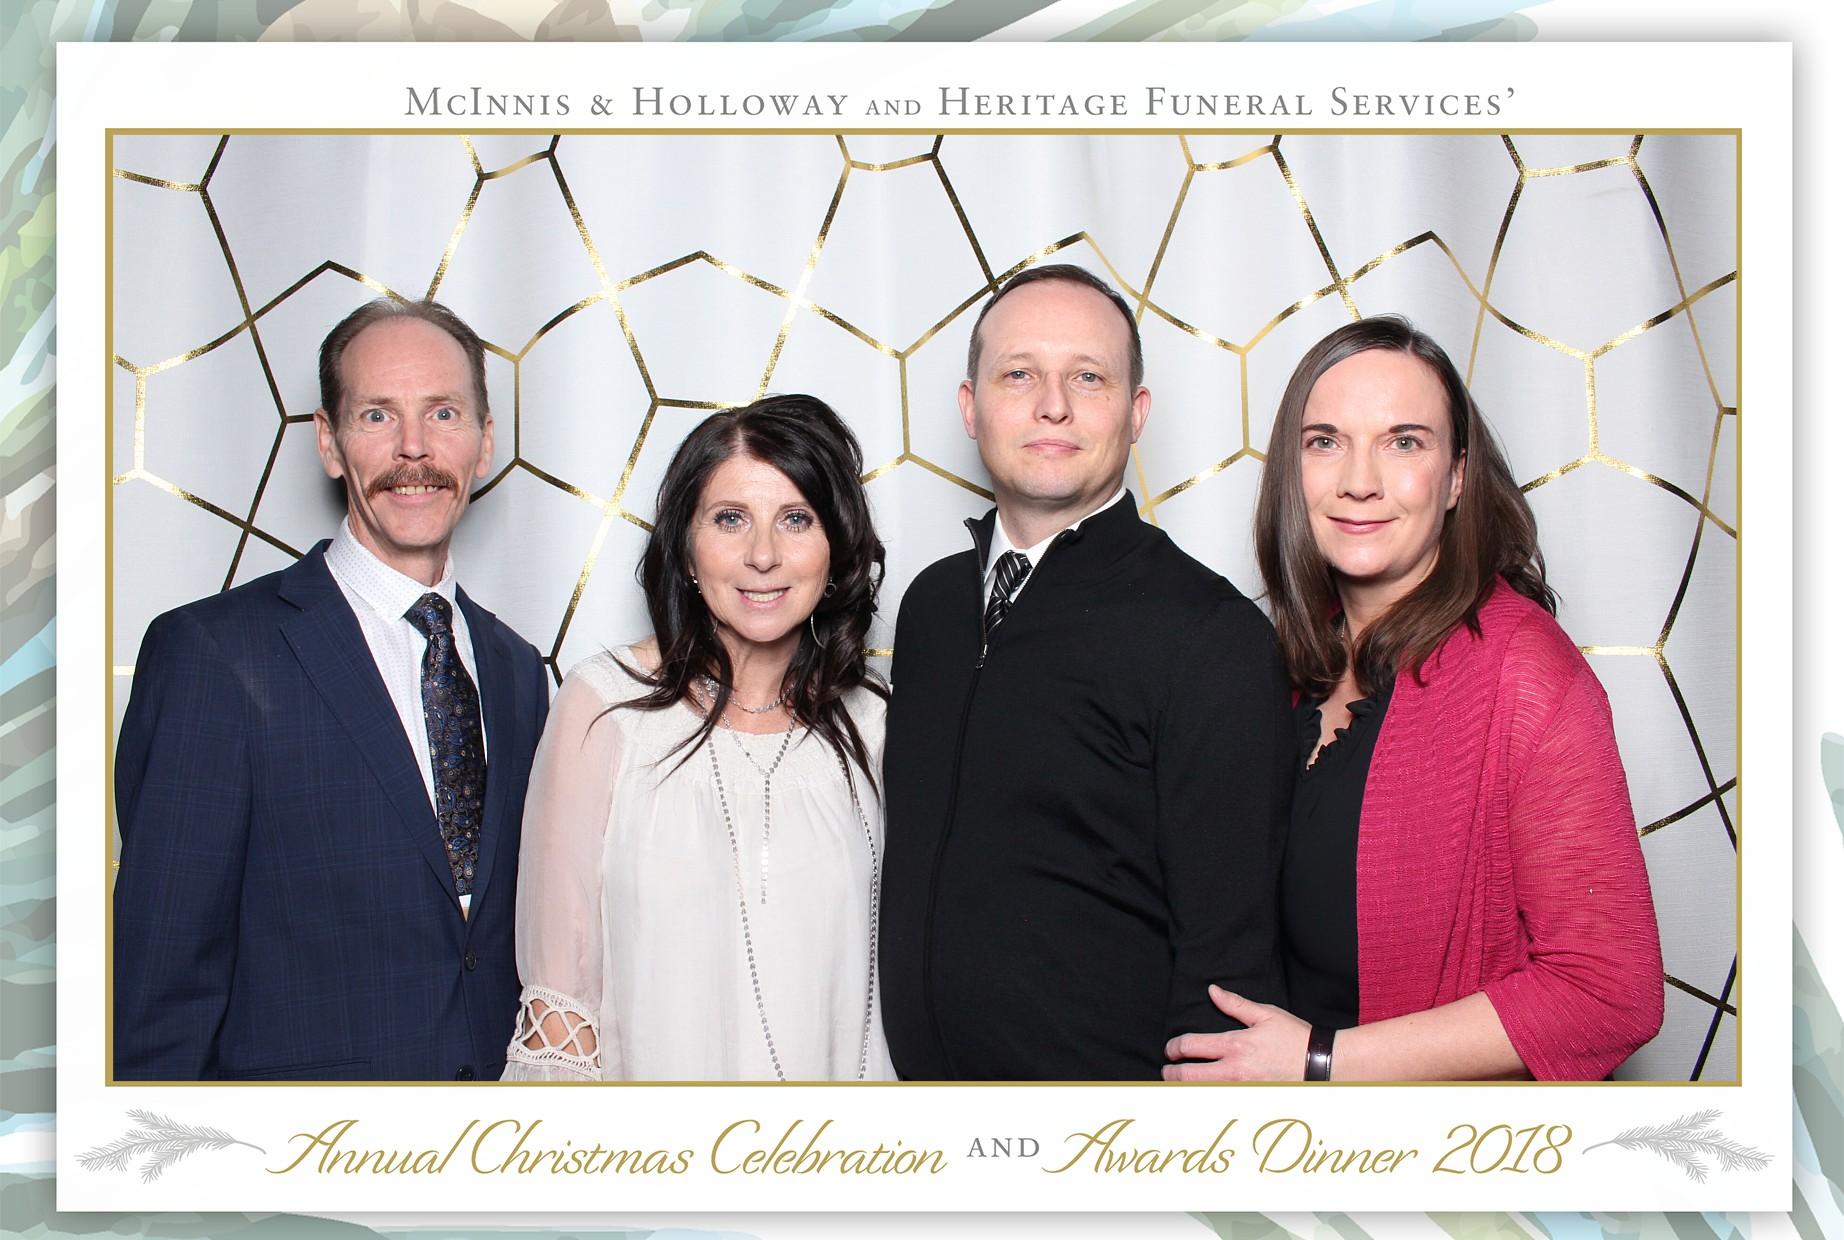 McInnisHolloway2018-0095-PRINT